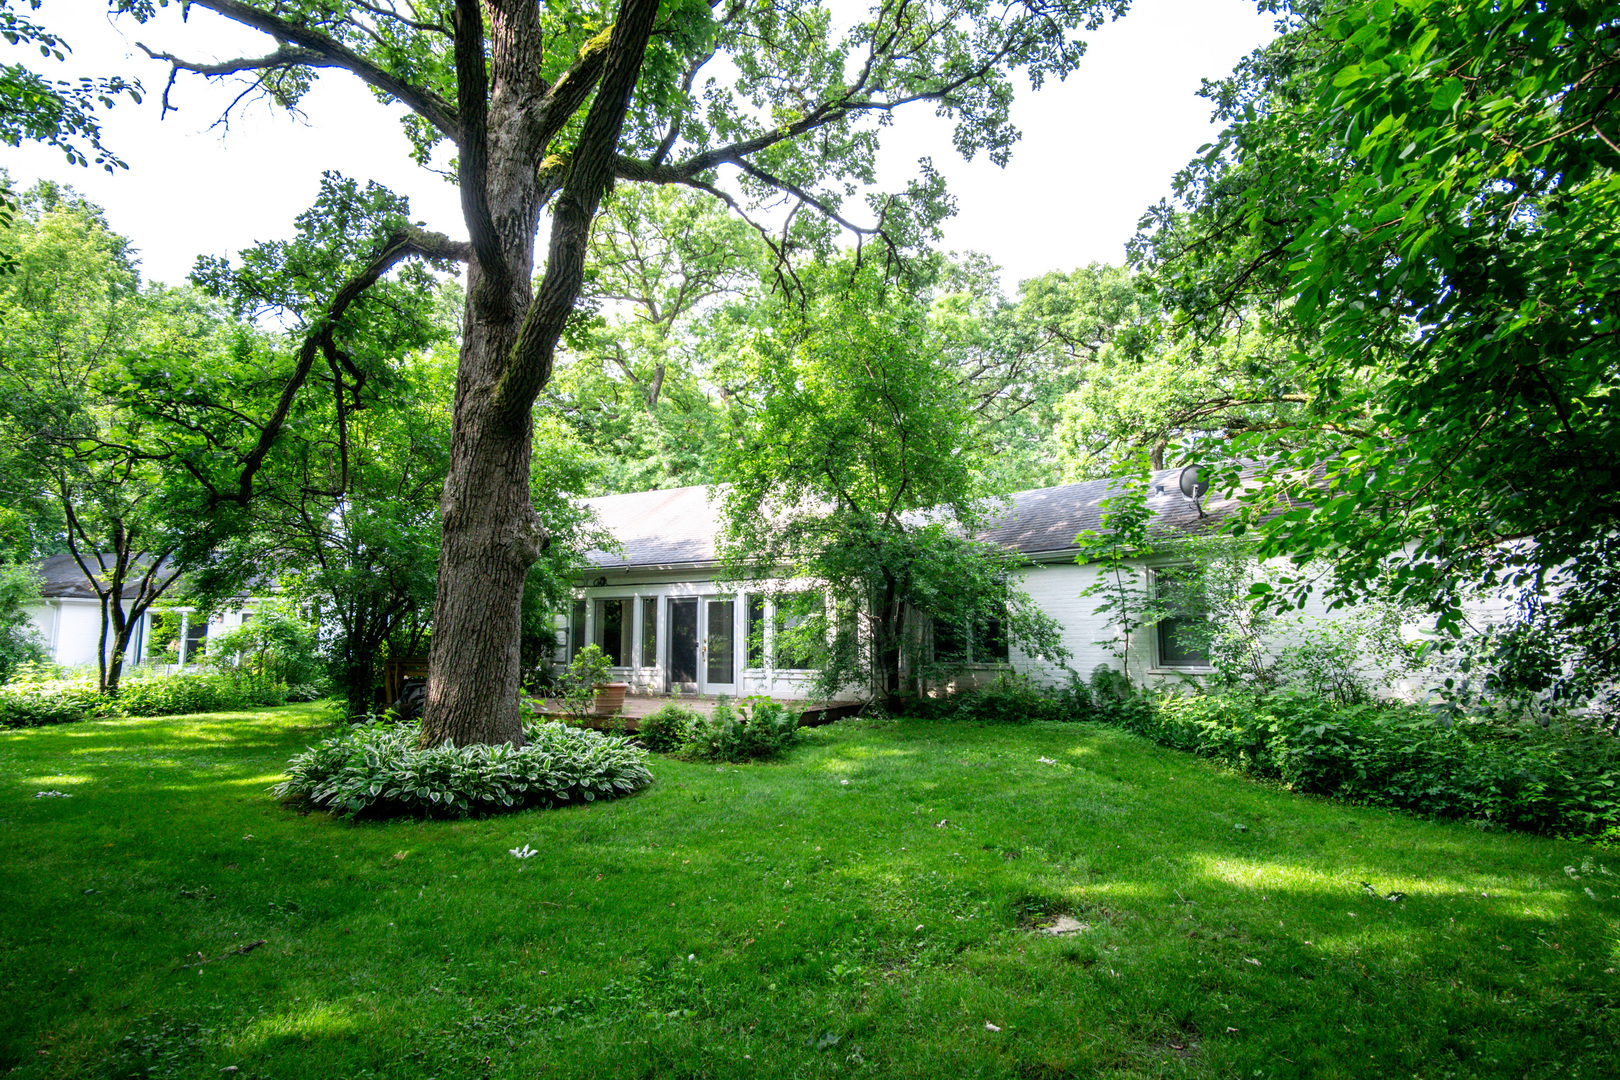 251 Woodland, NORTH BARRINGTON, Illinois, 60010